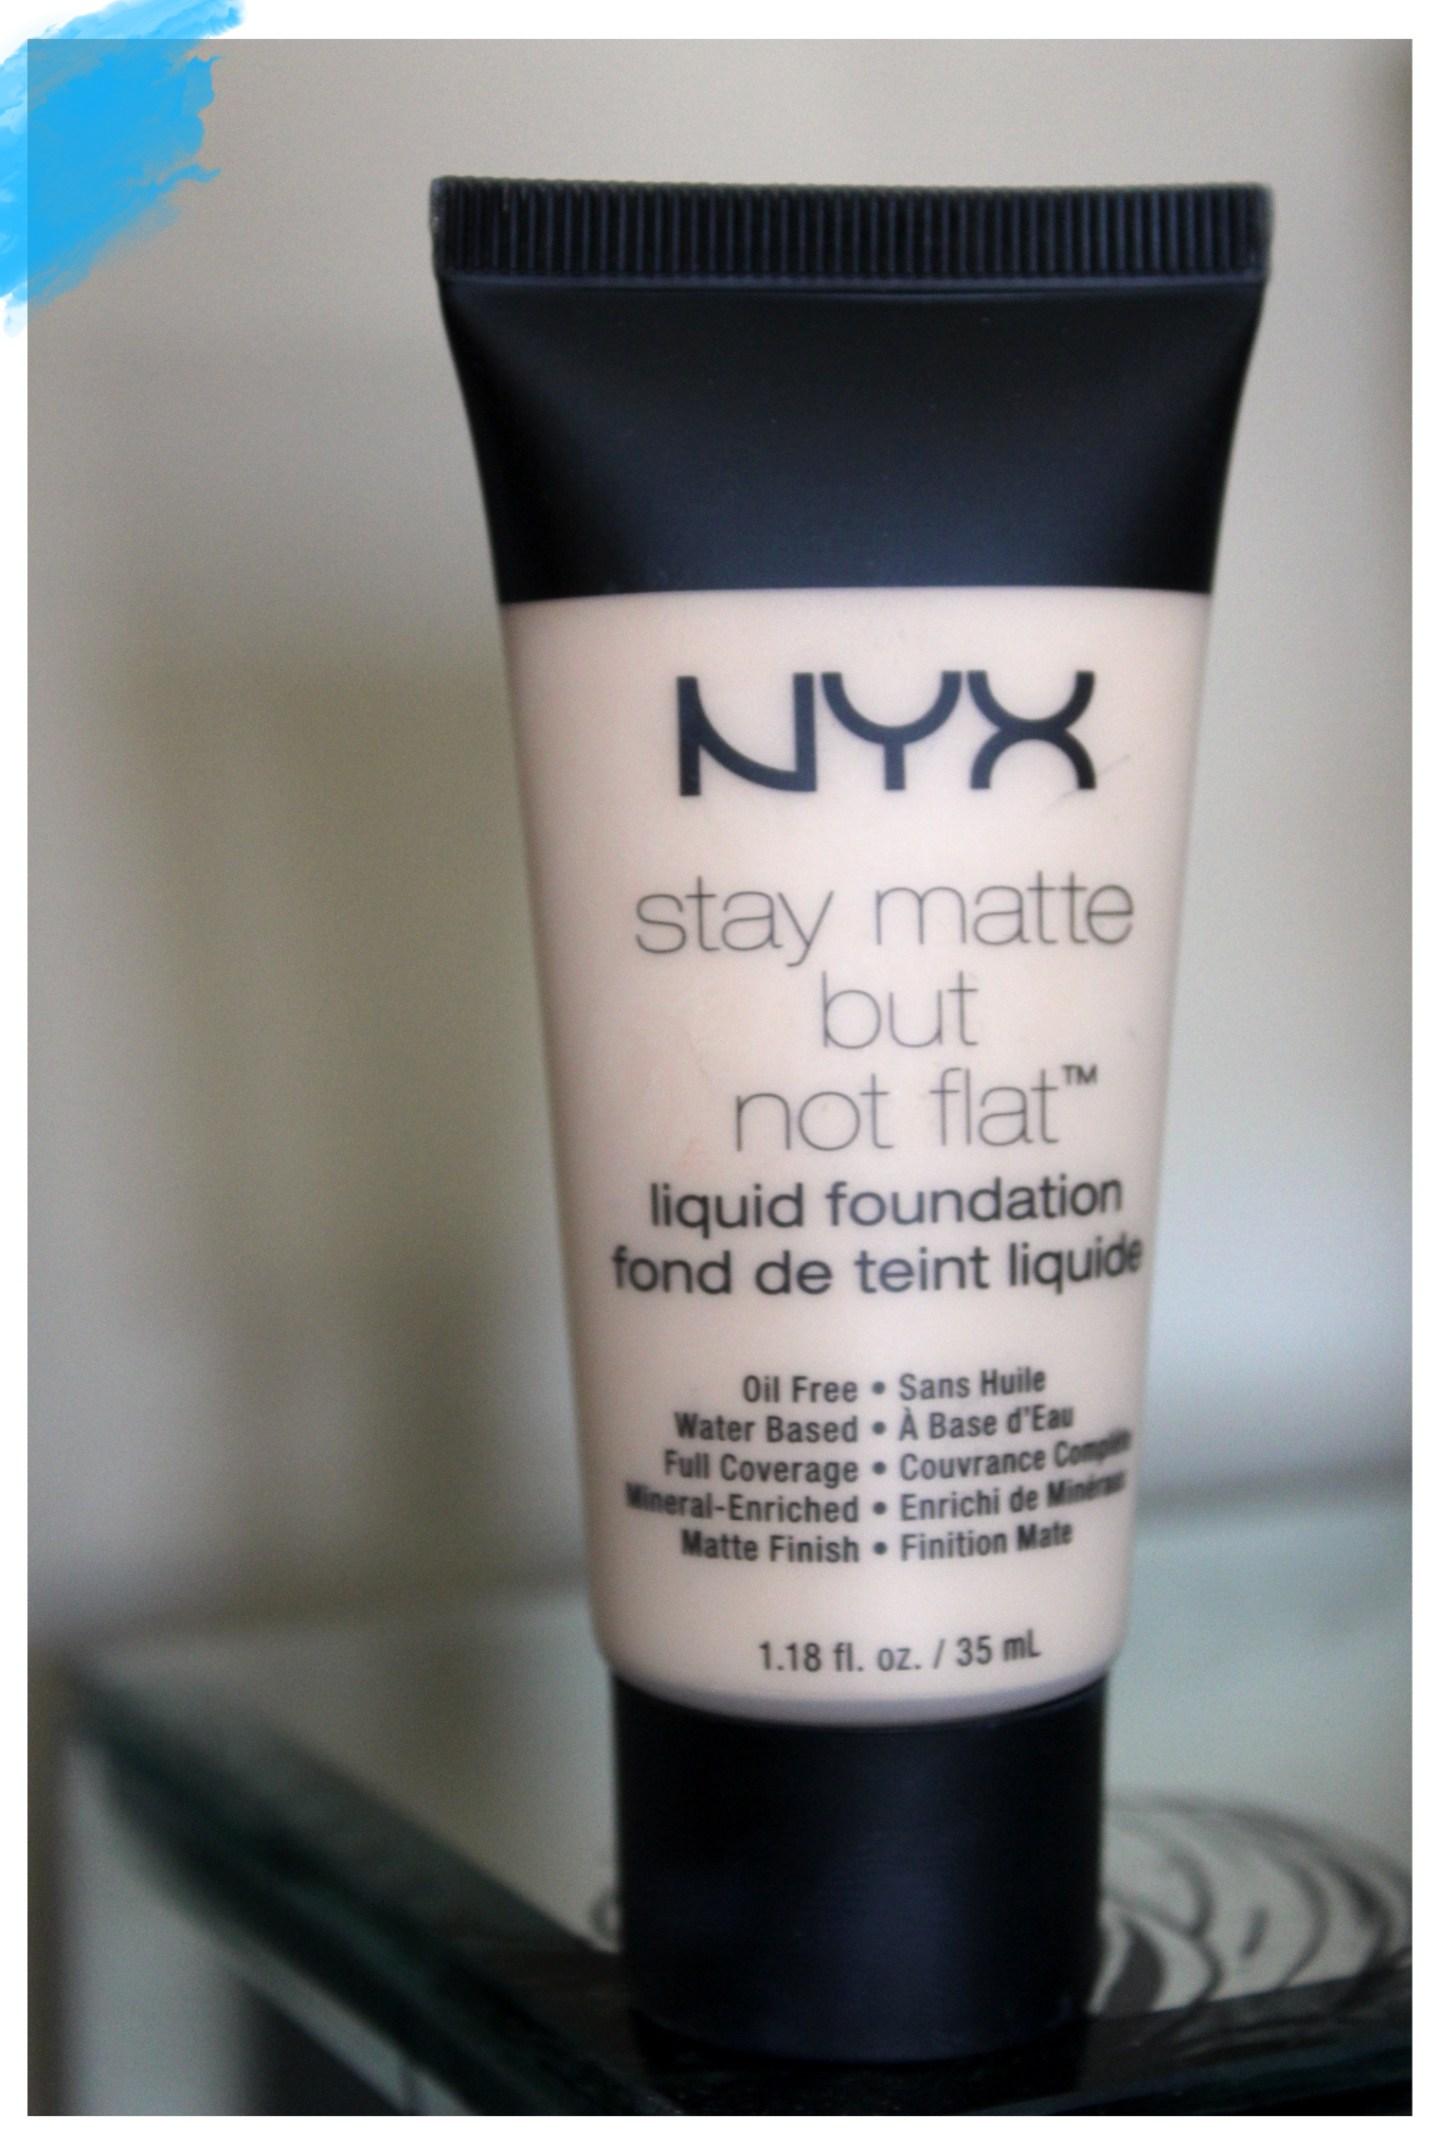 NYX Stay matte not Flat foundation